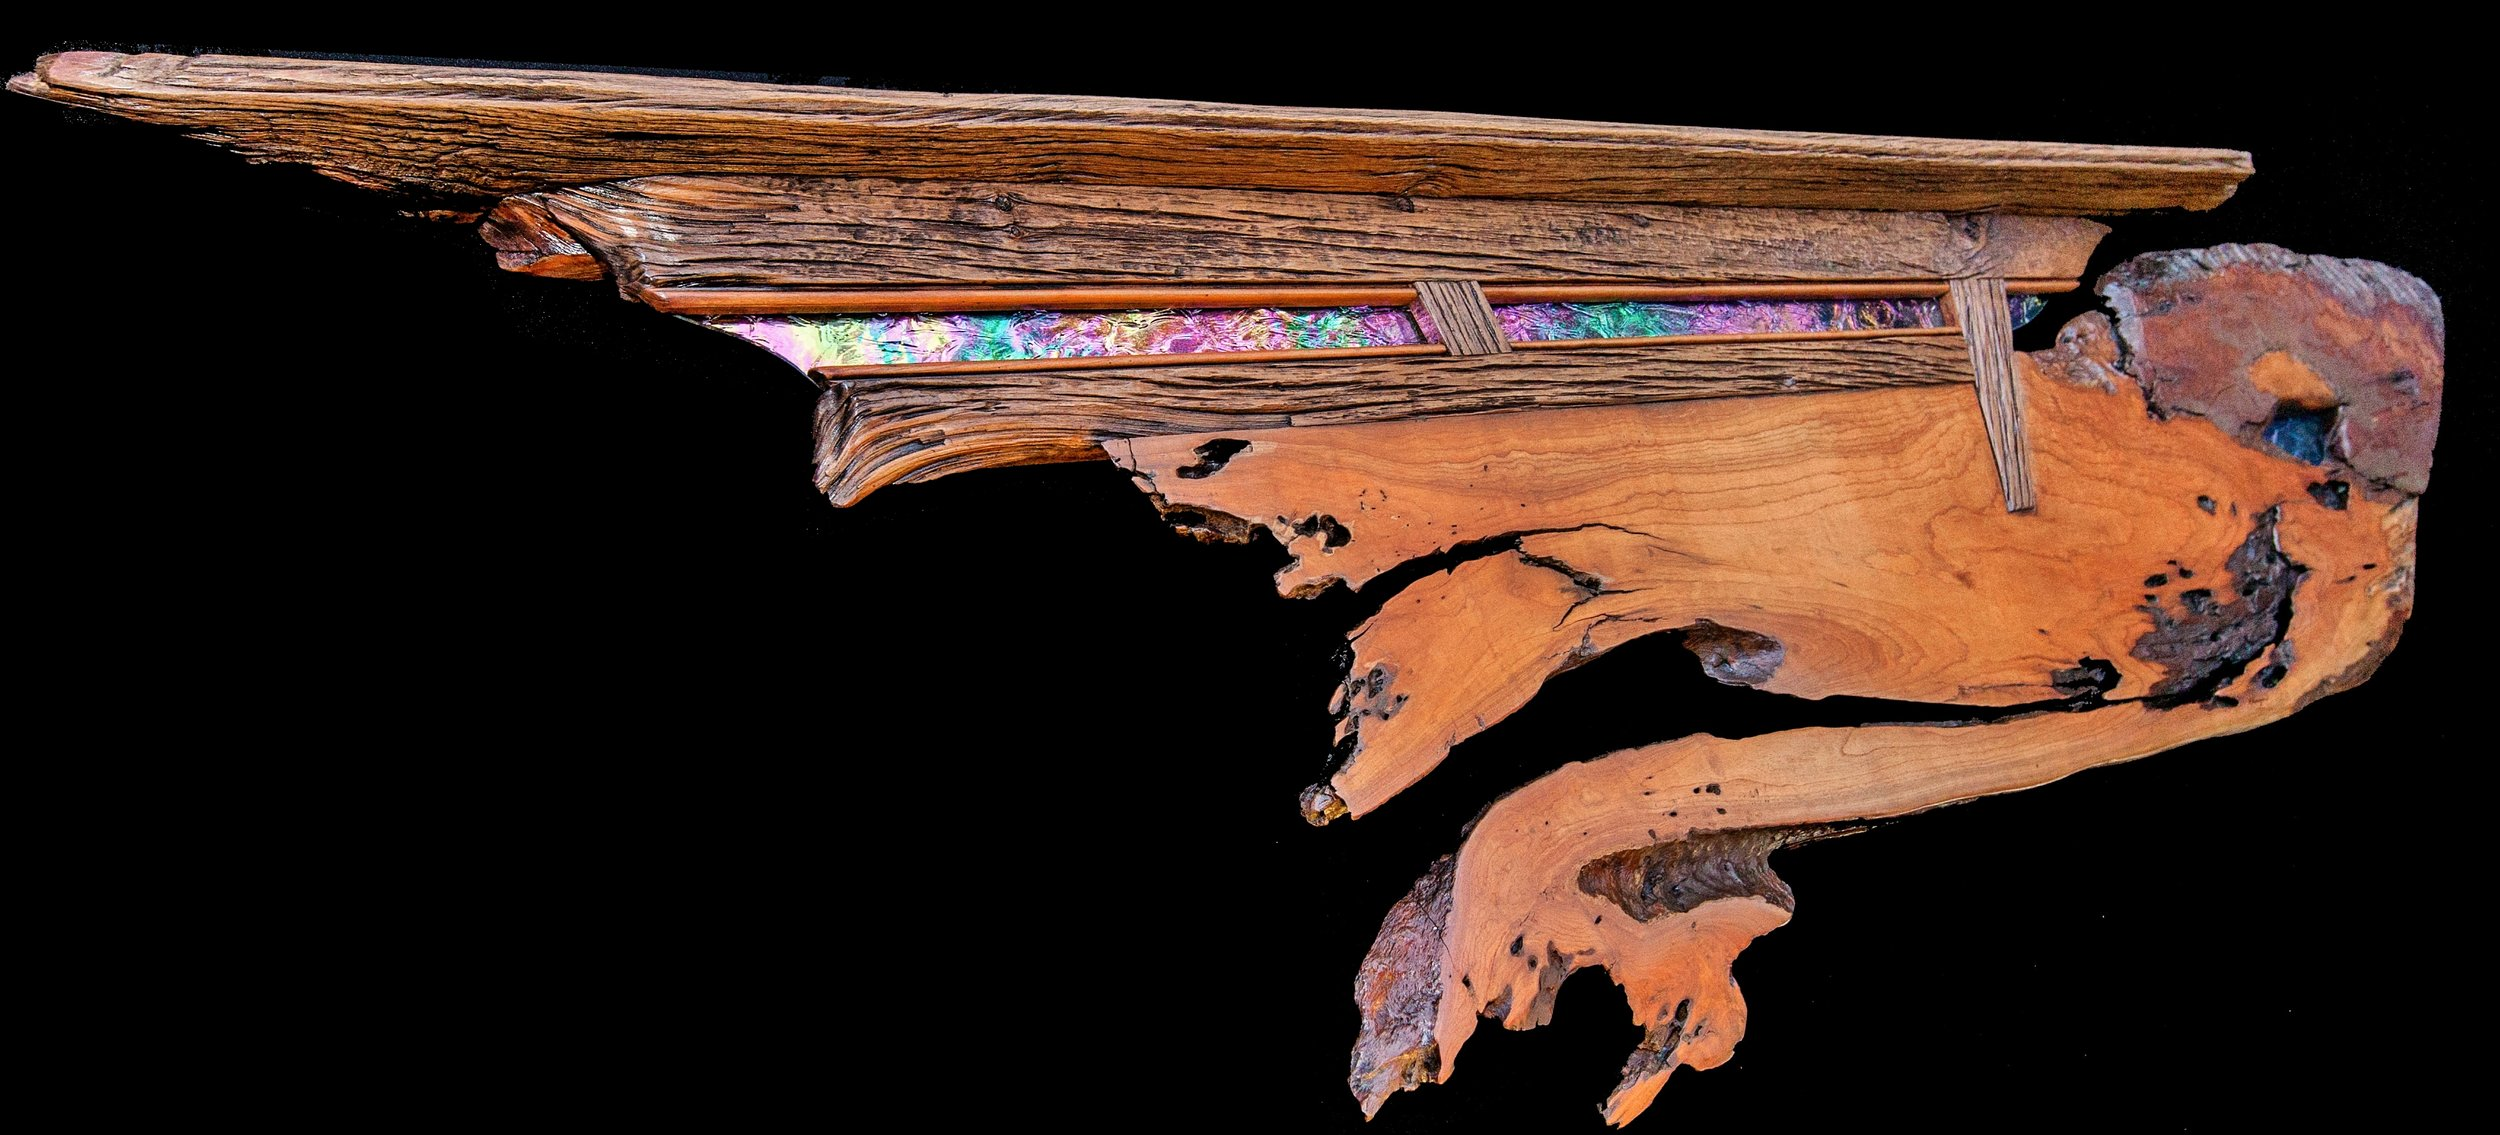 """Passing Through"" Headboard/Mantel/Shelf 5ft wall eco sculpture"